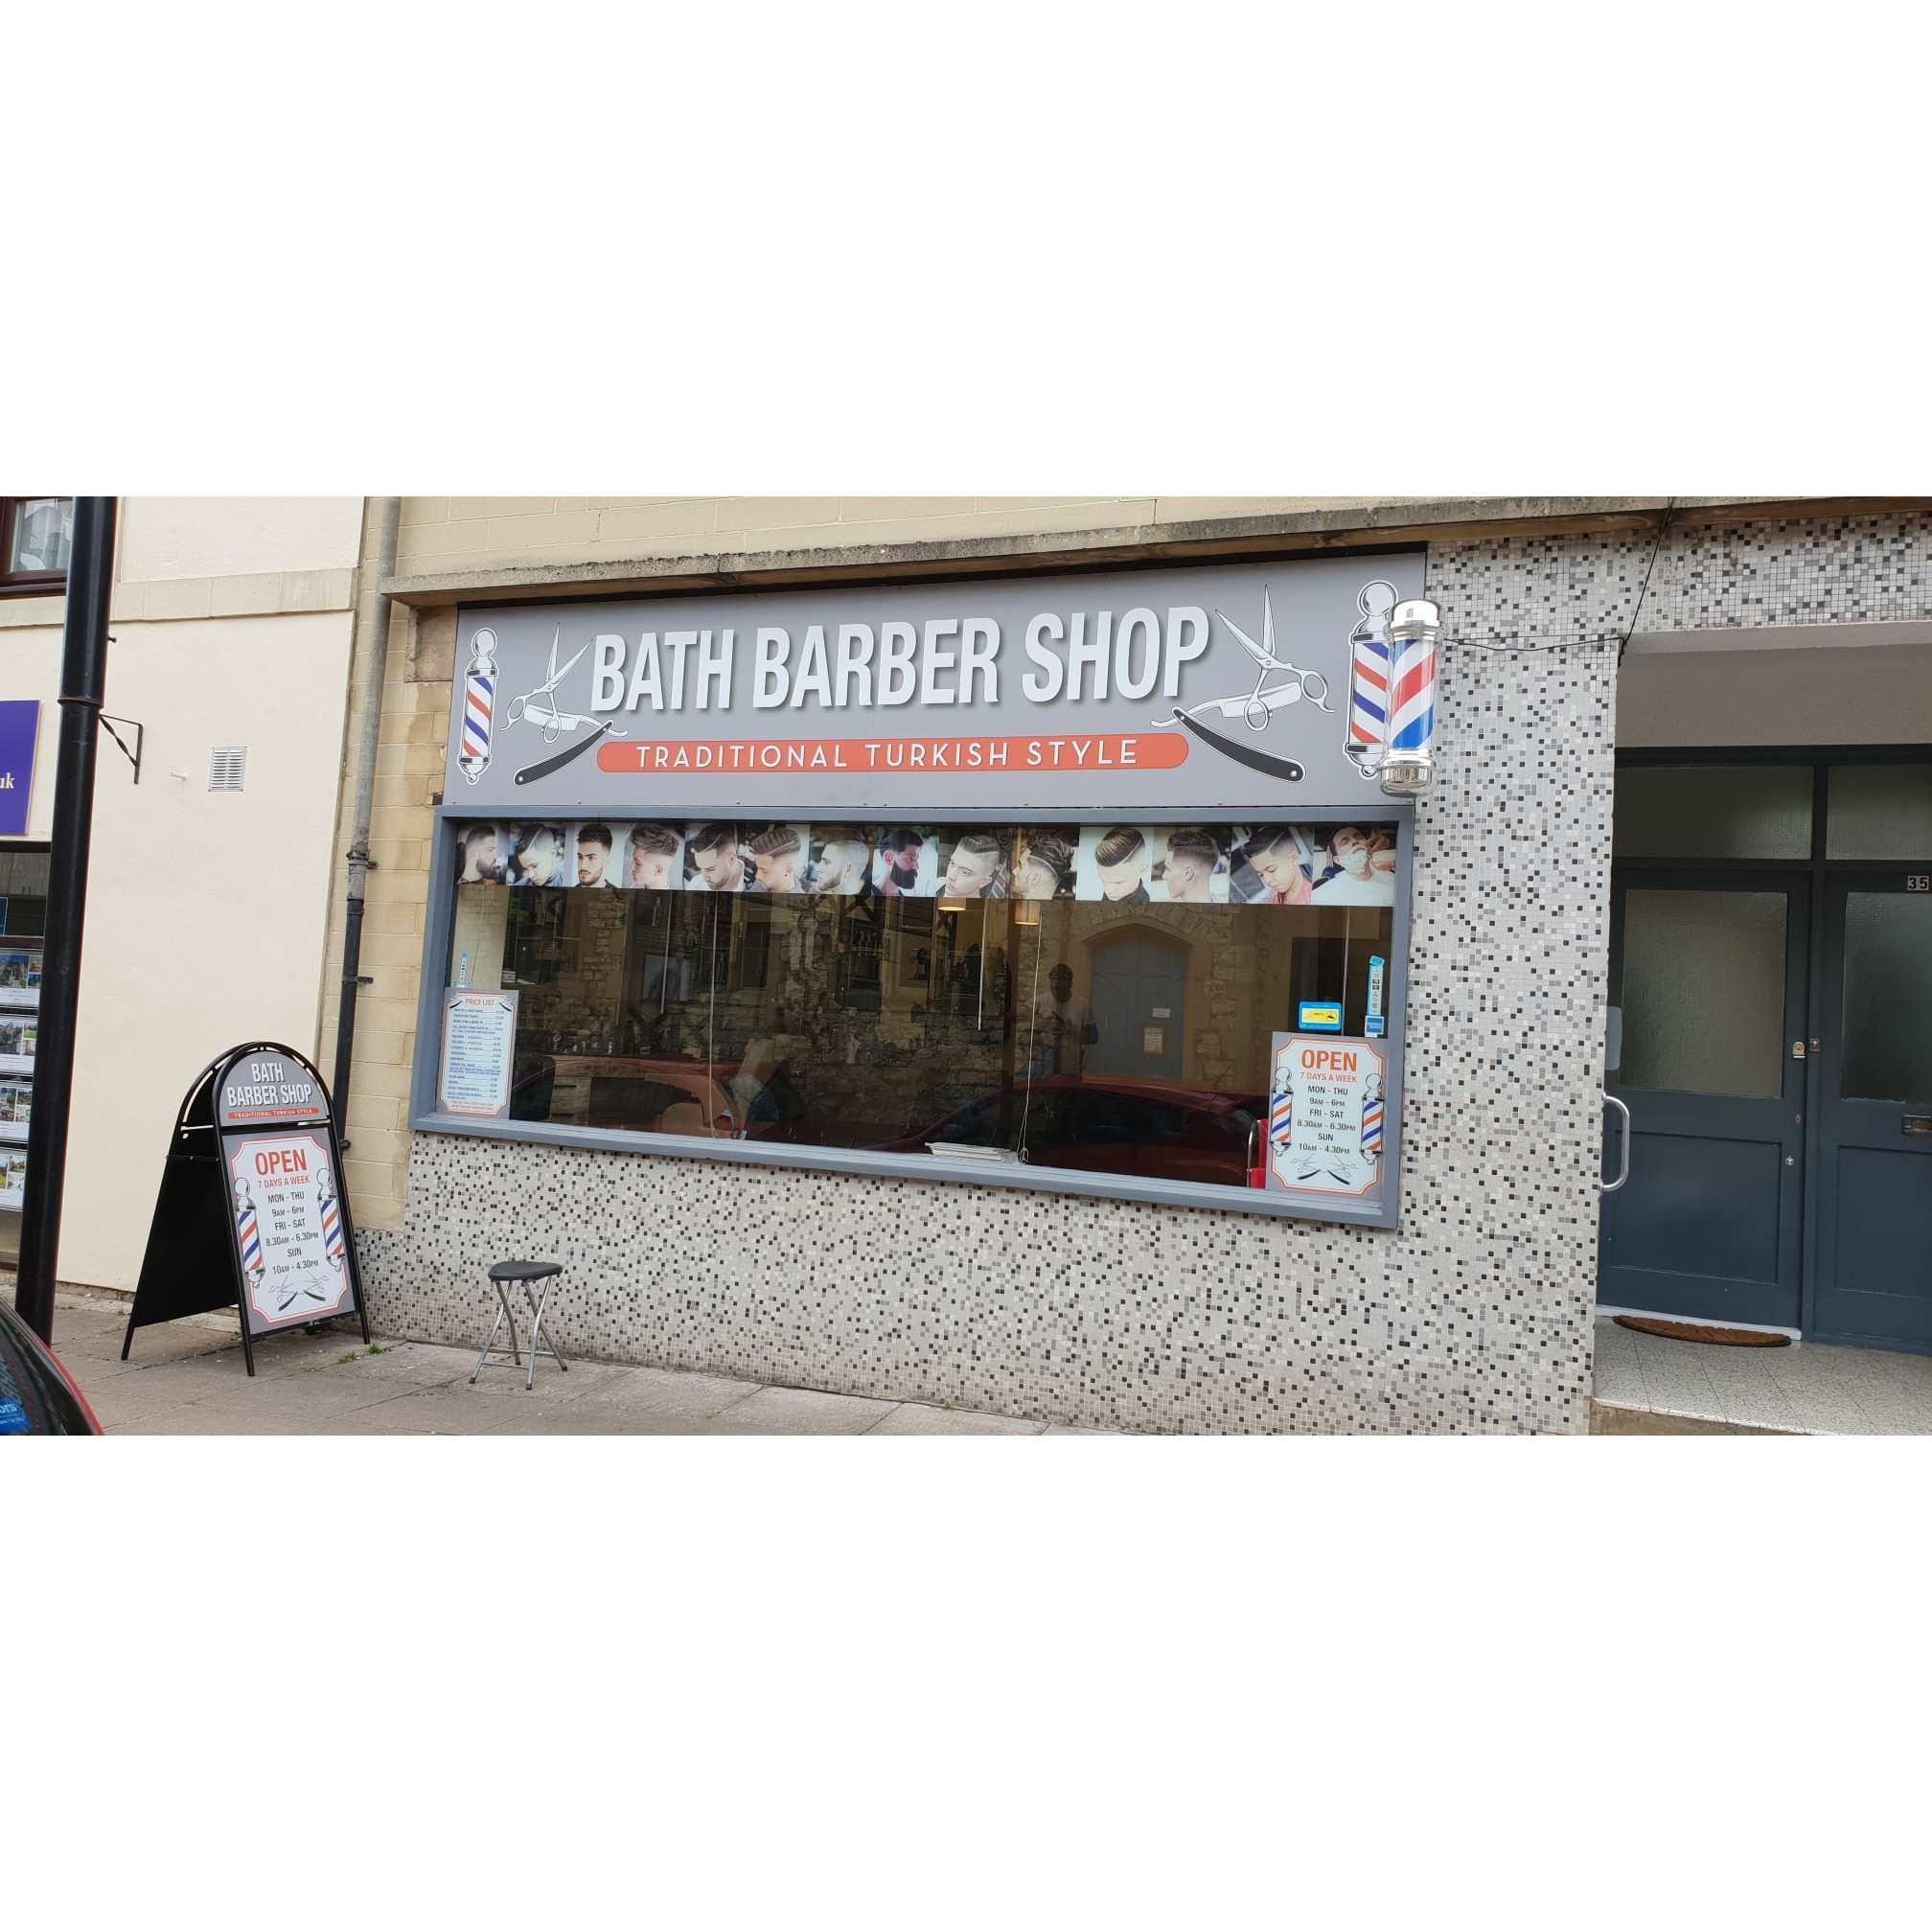 Bath Barber Shop - Bath, Somerset BA1 4BX - 07572 759896 | ShowMeLocal.com